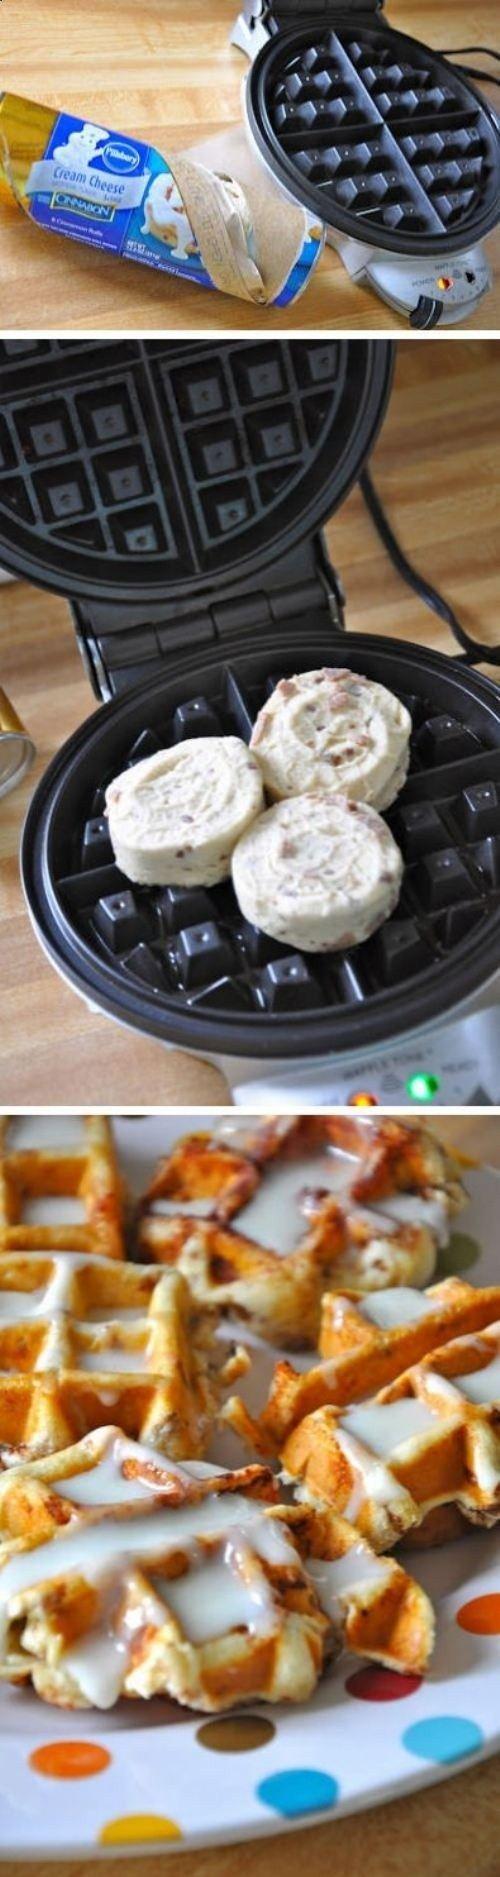 Cinnamon Roll Waffles with Cream Cheese Glaze recipe